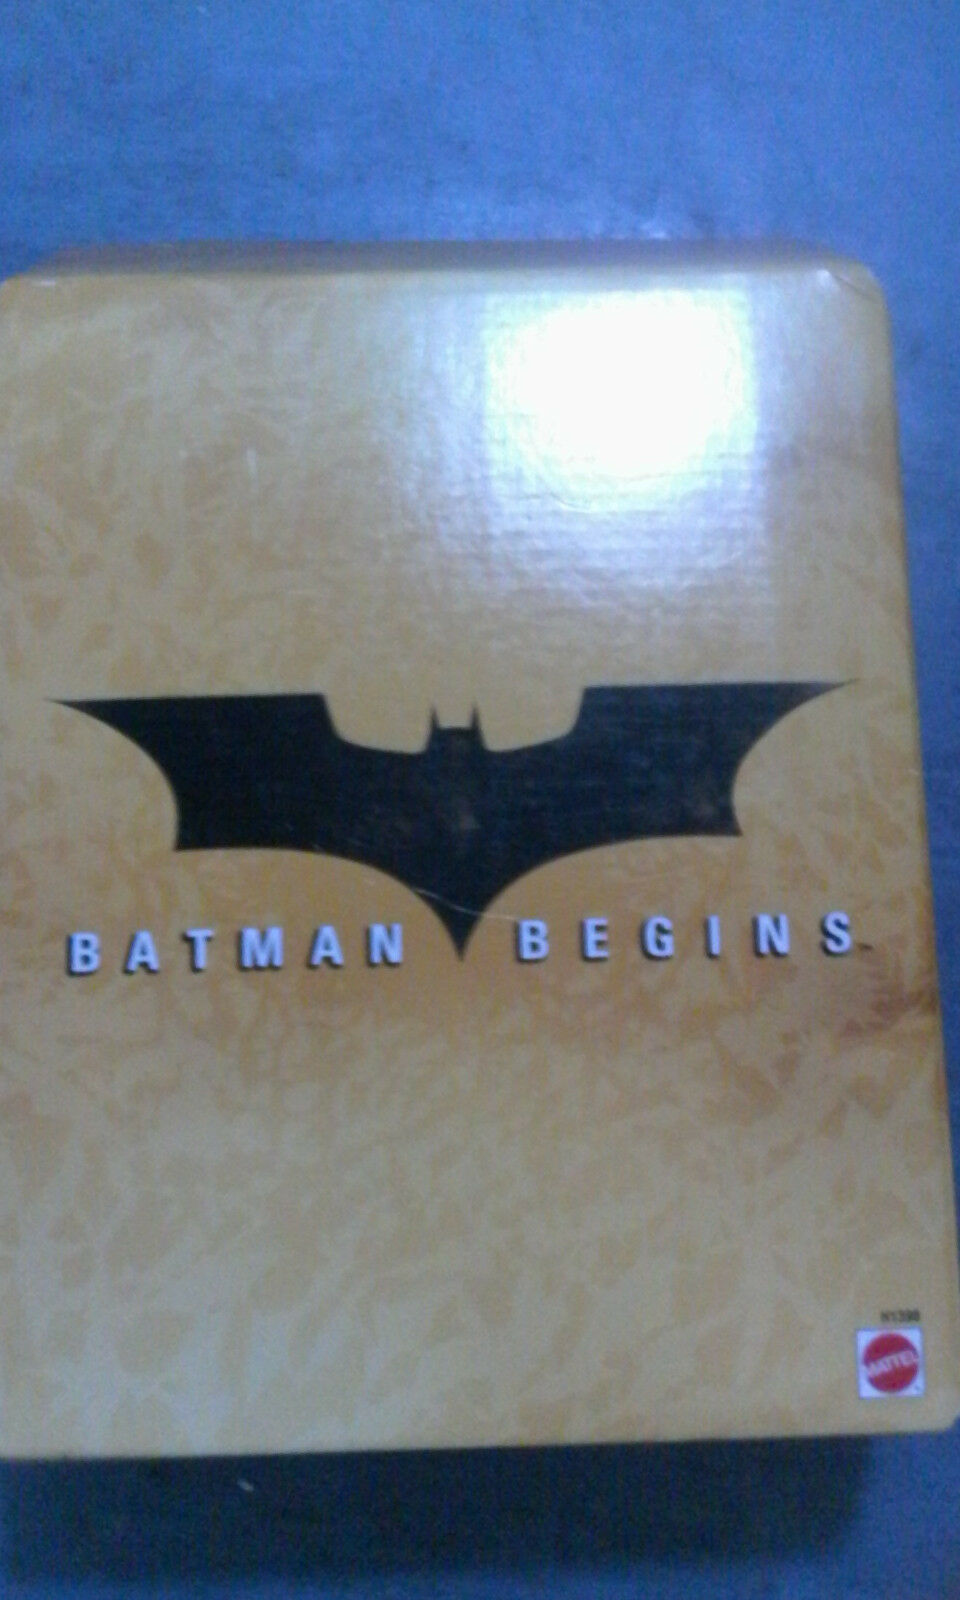 Mattel batman begins bereinkommen exklusive 2005